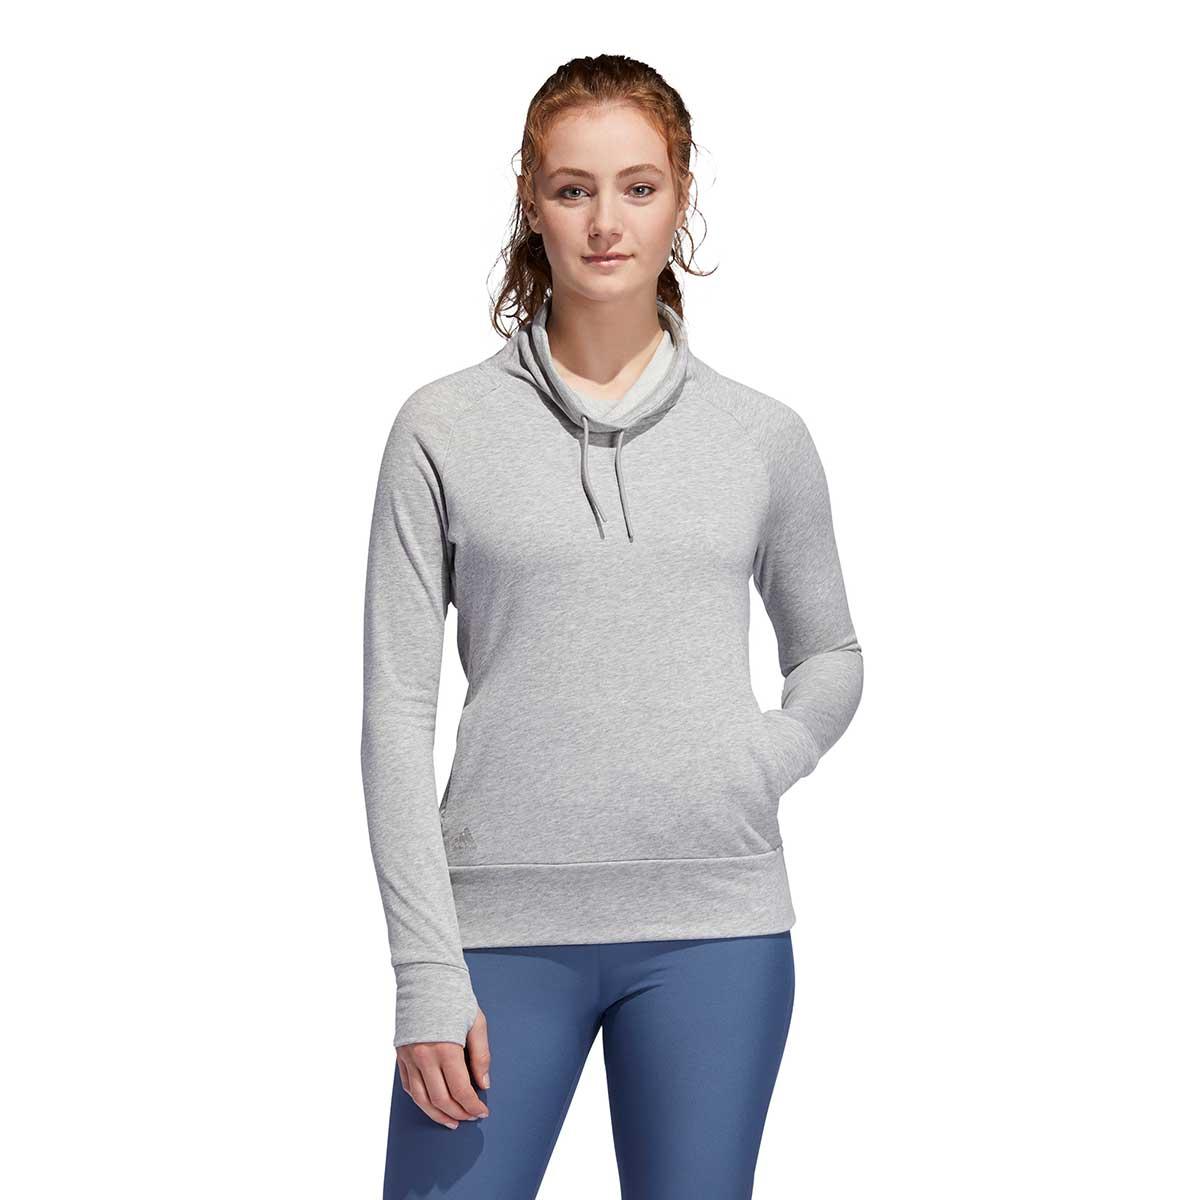 Adidas Women's Club Pullover Sweater